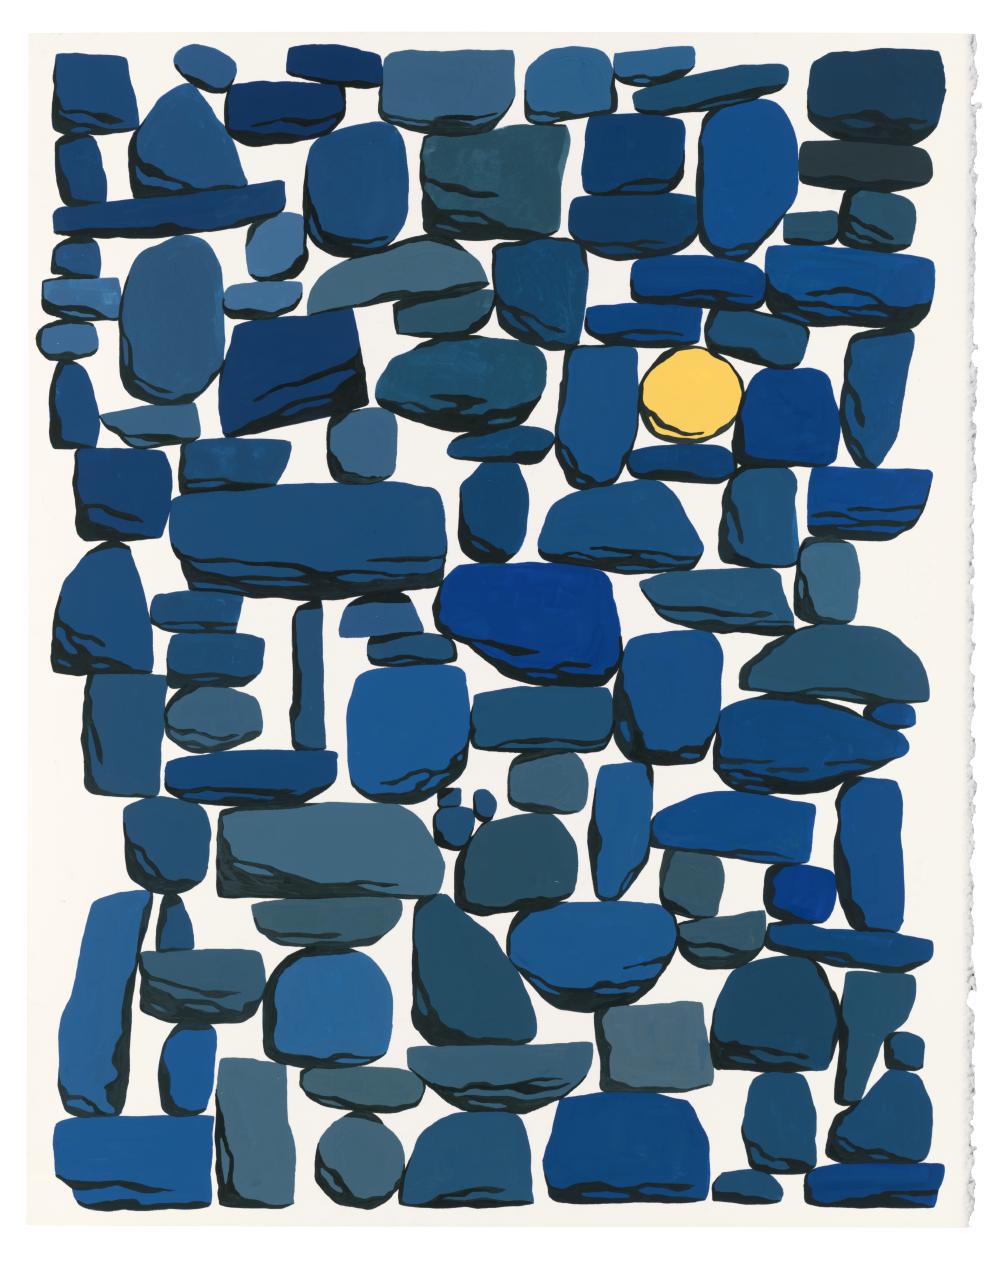 Evening, Gouache on paper, 2017, 16 x 20